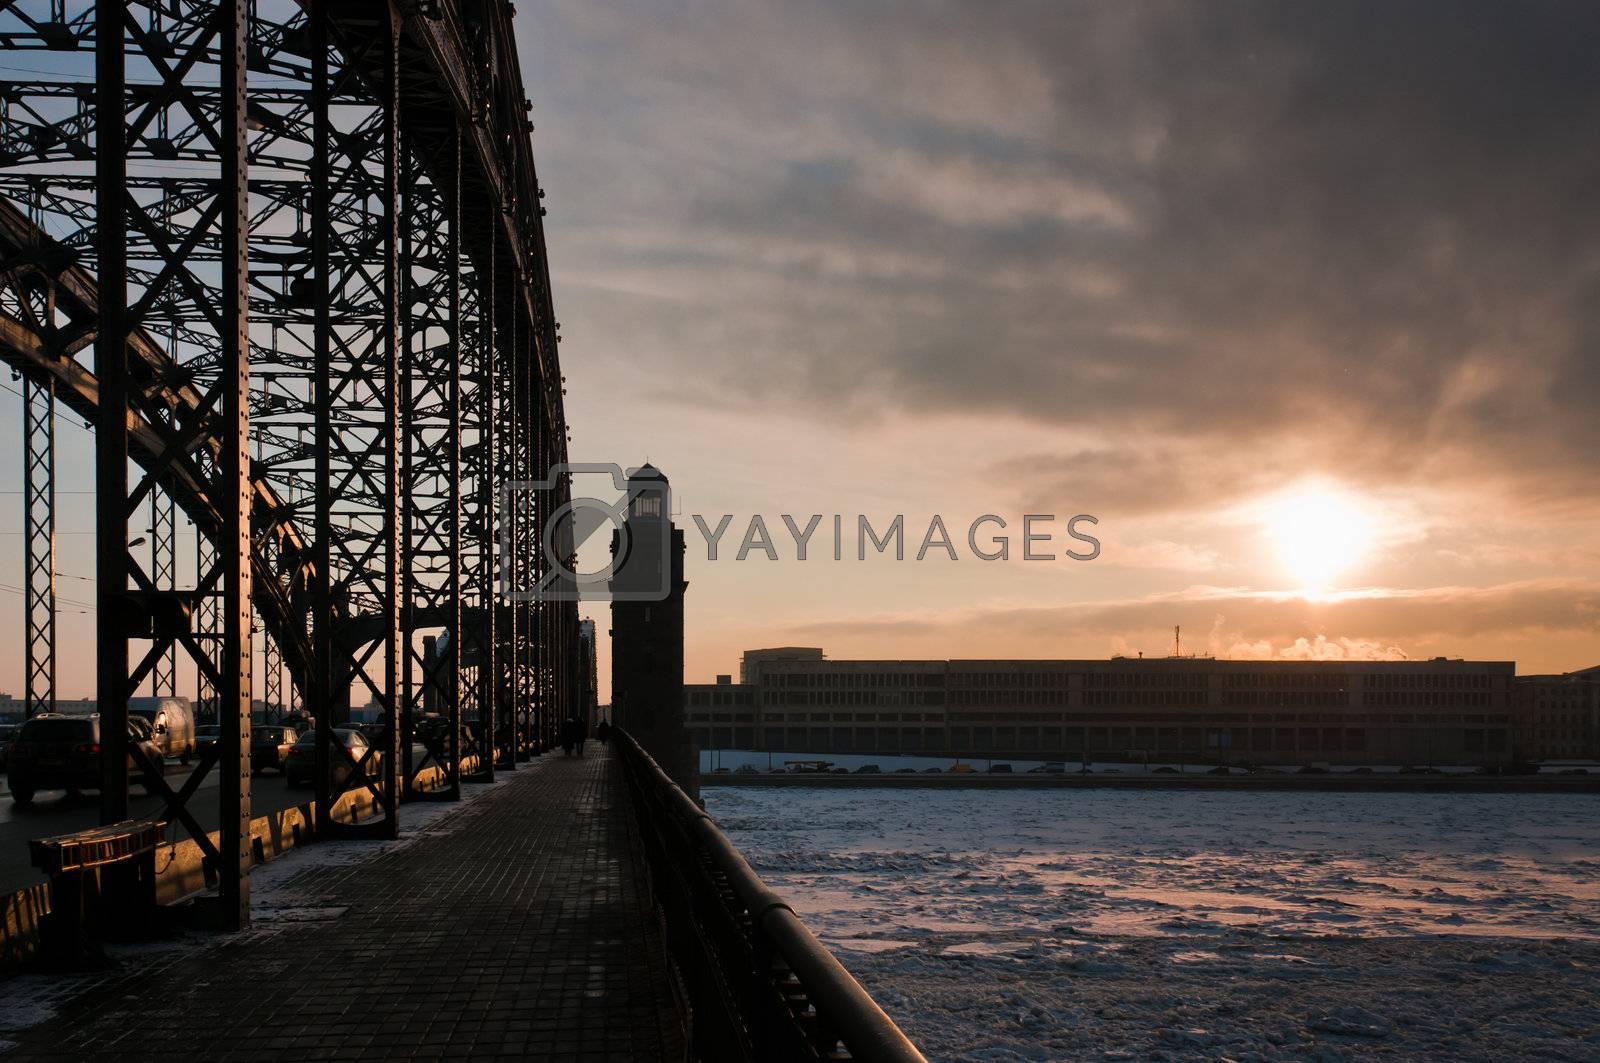 Sunrise from the bridge by dmitryelagin